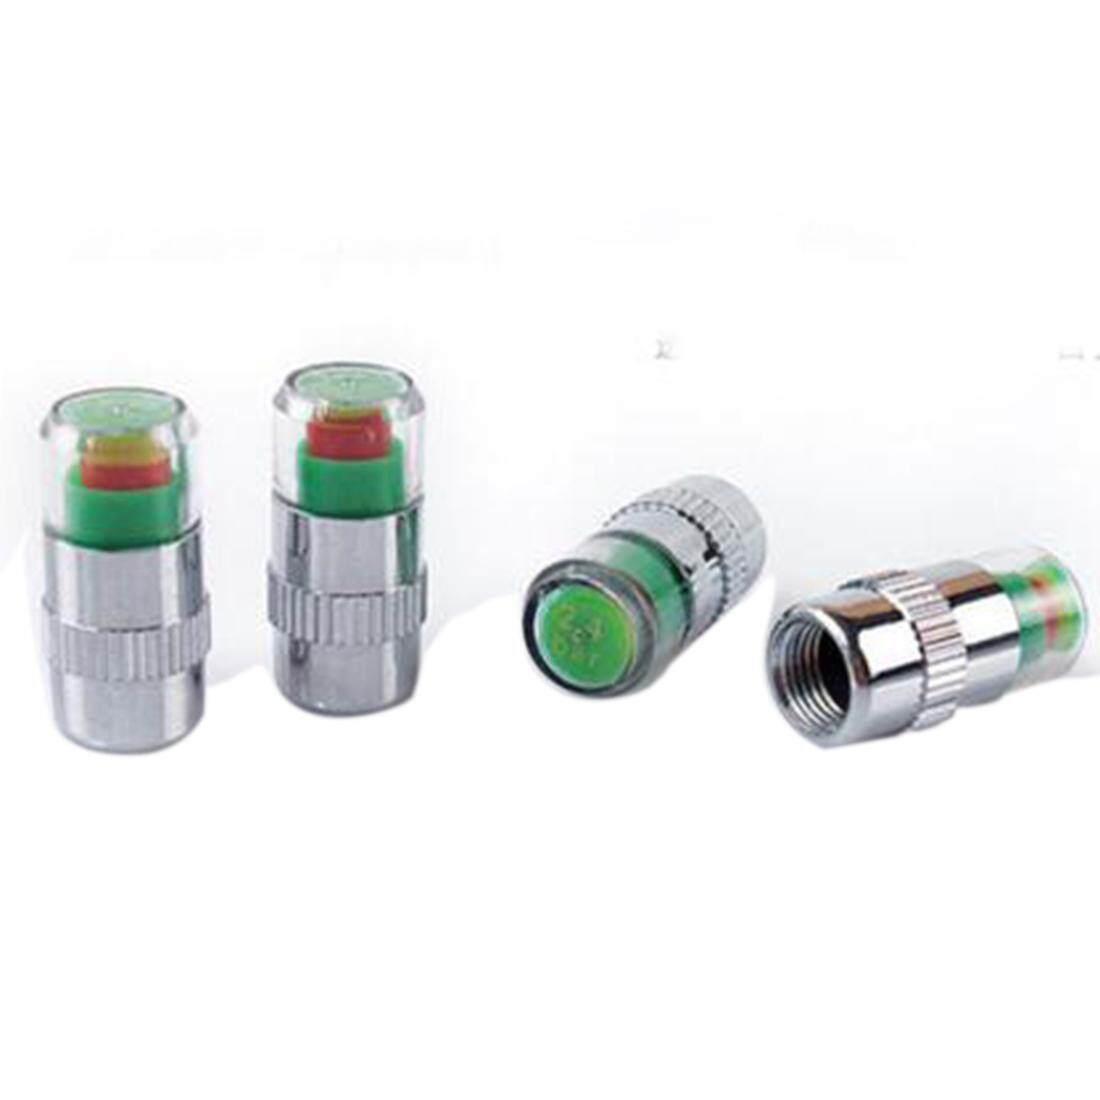 4 pcs 2.4Bar (36PSI) Auto Air Pressure Alert Indicator Valve Stem Monitor Sensor Caps Car Free Shipping - intl